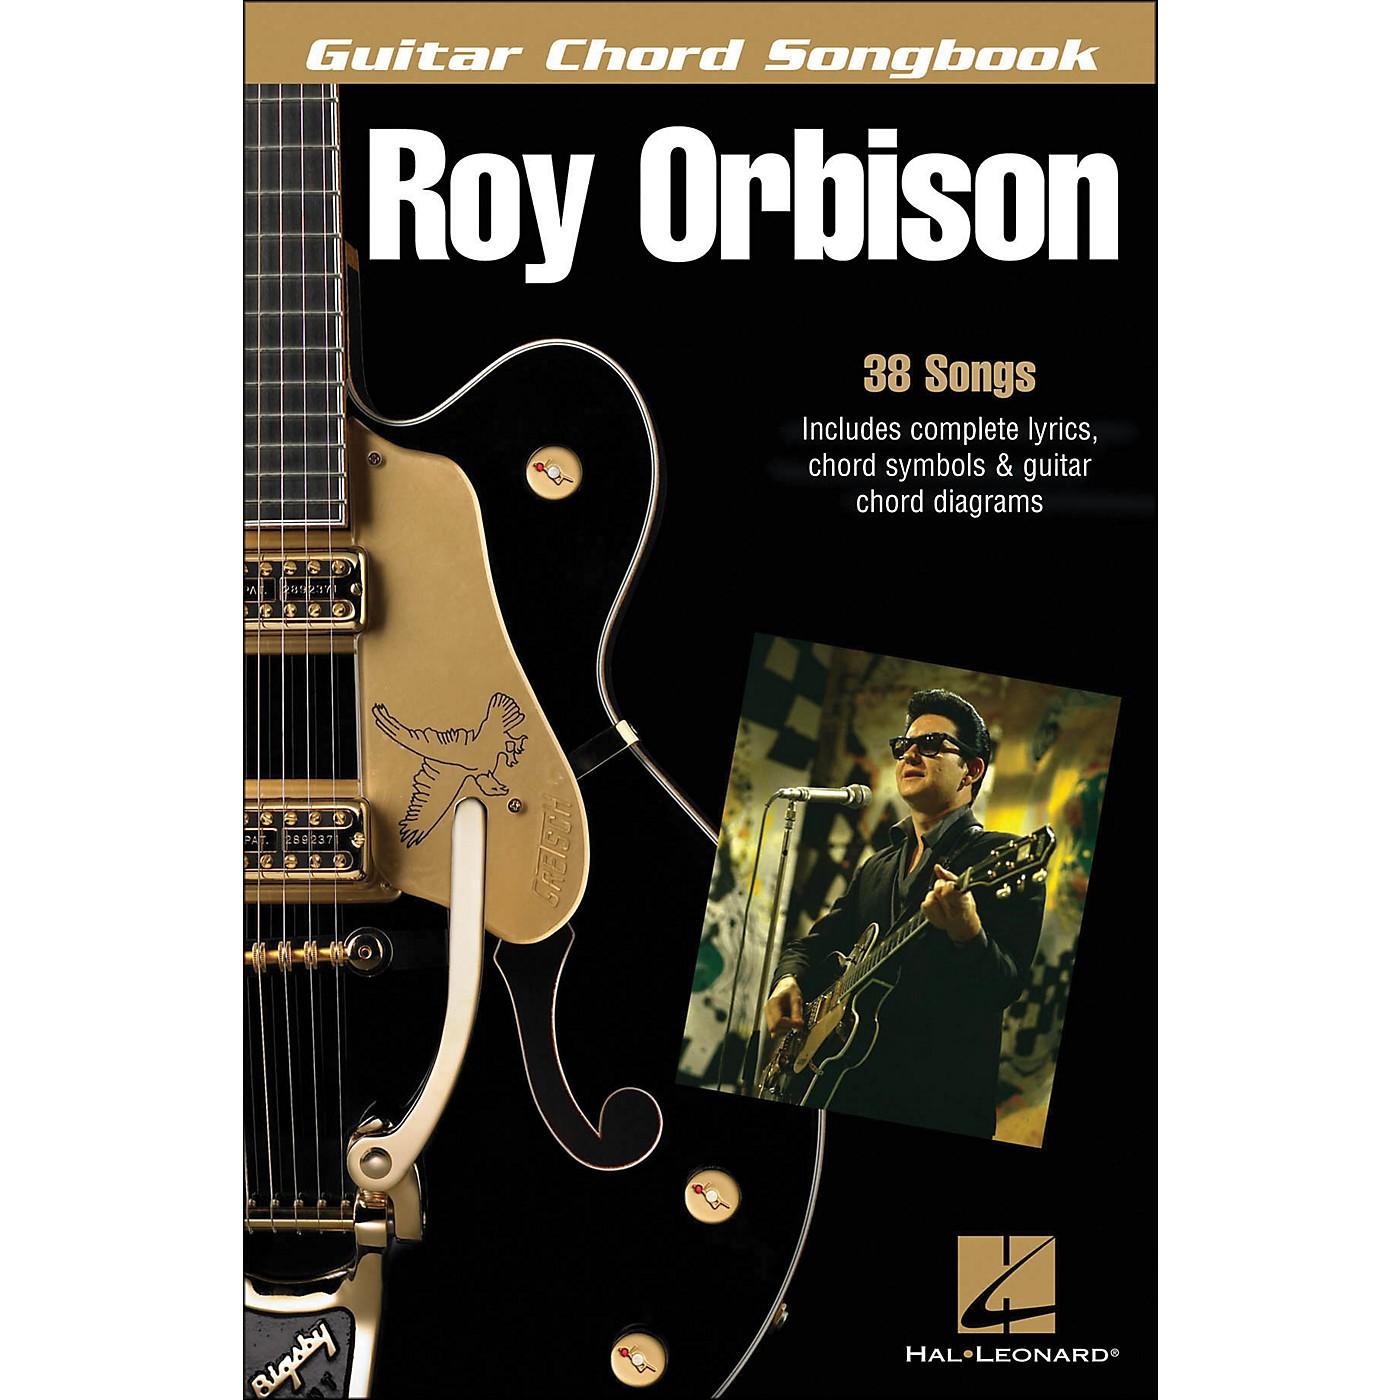 Hal Leonard Roy Orbison Guitar Chord Songbook thumbnail